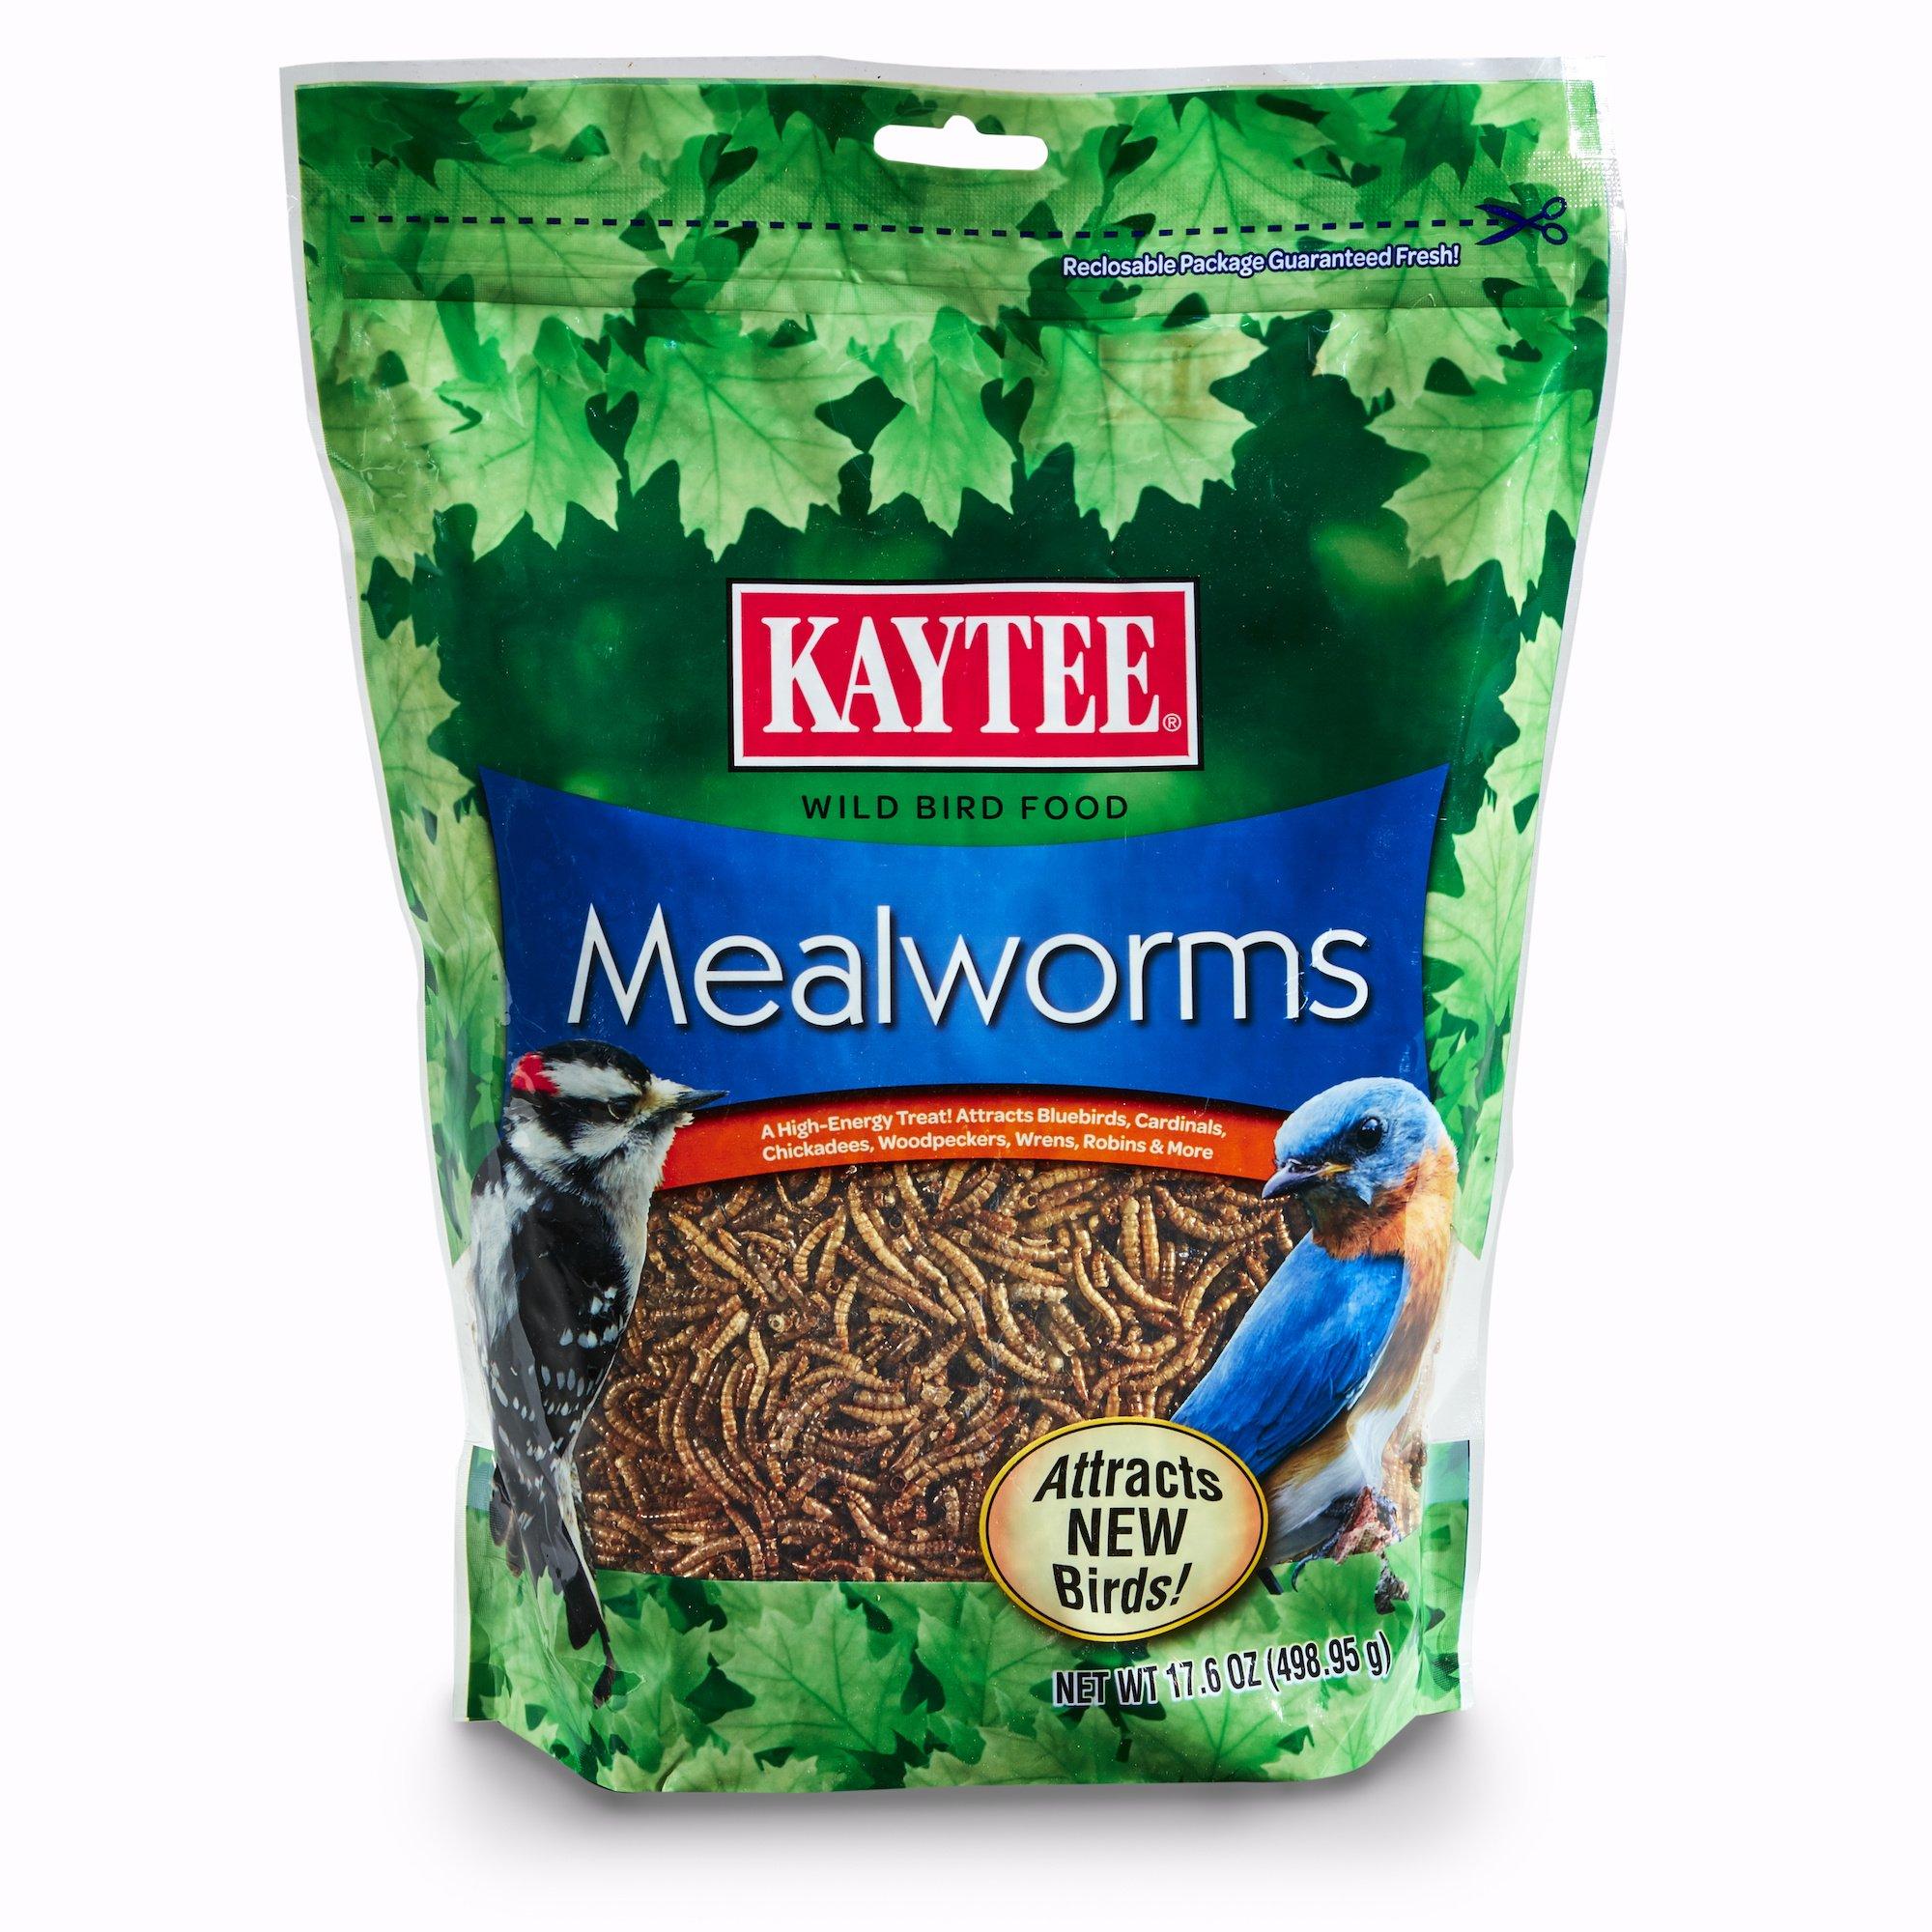 Kaytee 100505655 Mealworms, 17.6 oz, 17.6 Ounce by Kaytee